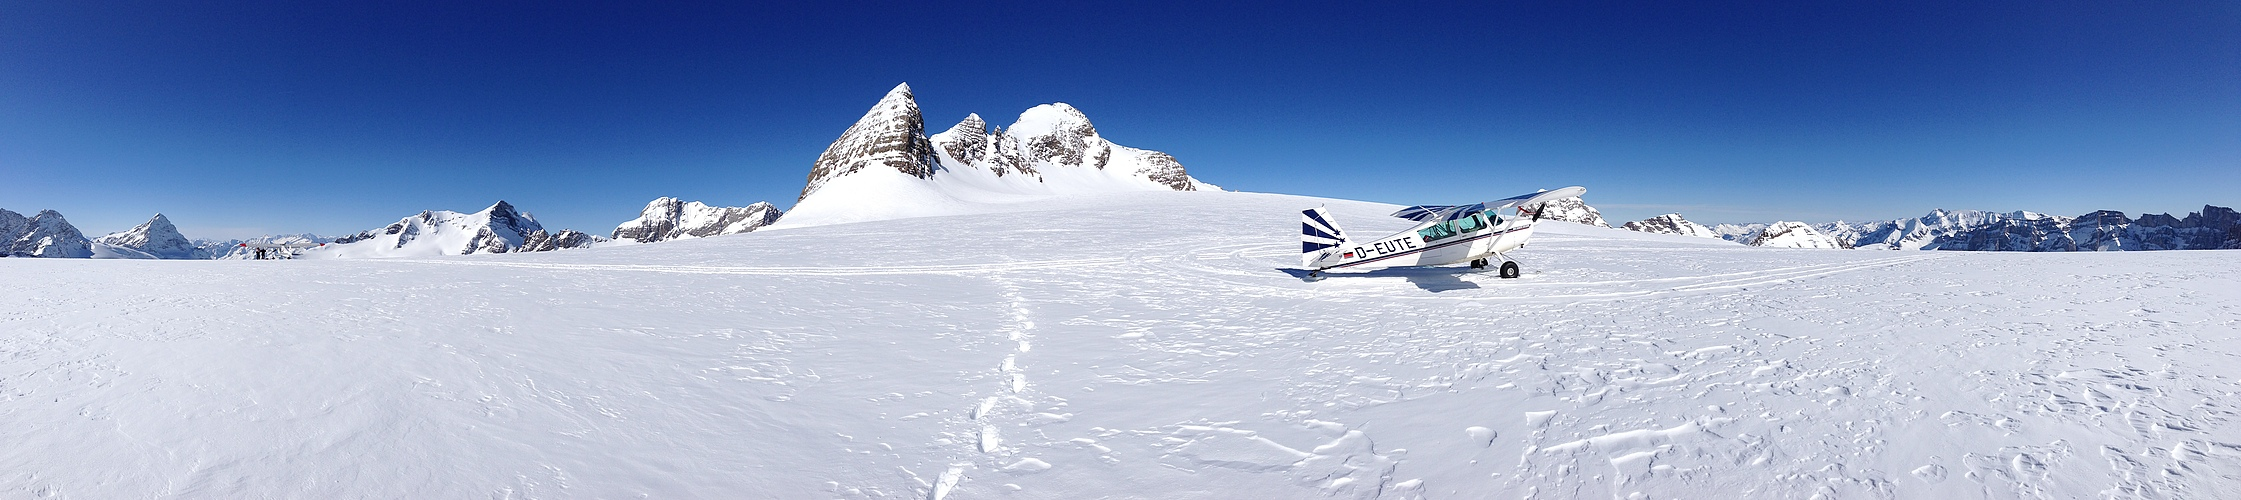 Gletscherlandung -am Hüfi - Schweiz  - D-EUTE - Johann Harlander - Arno Thurnbichler